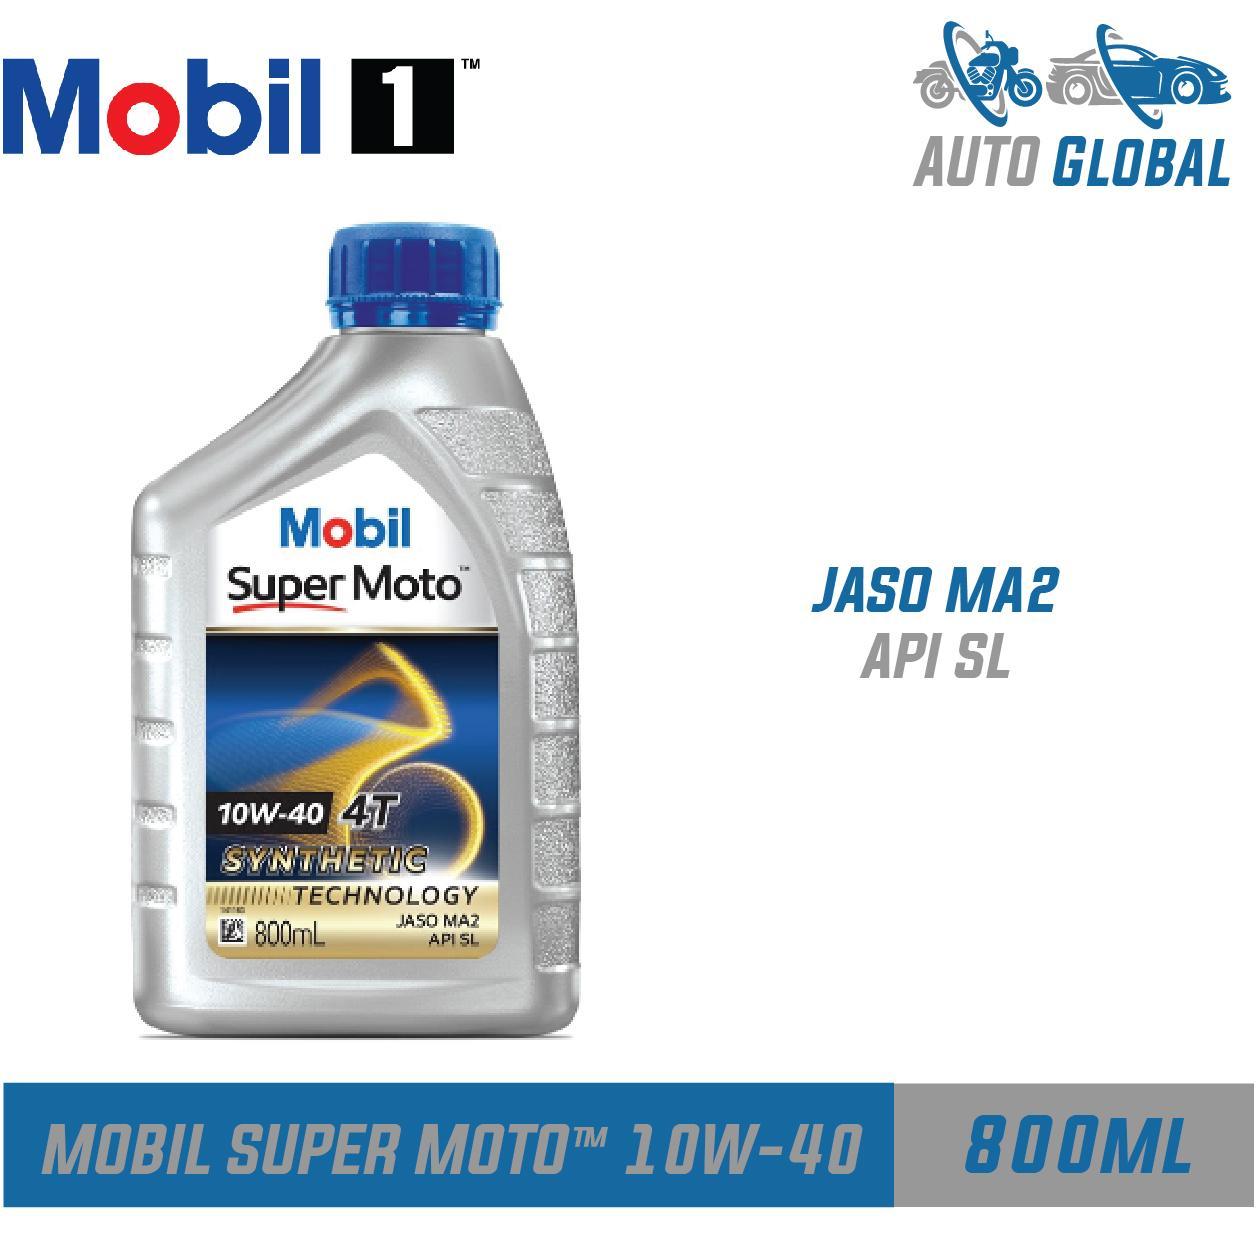 Mobil1 Mobil Super Moto 10W-40 (800mL) four-stroke motorcycle oil